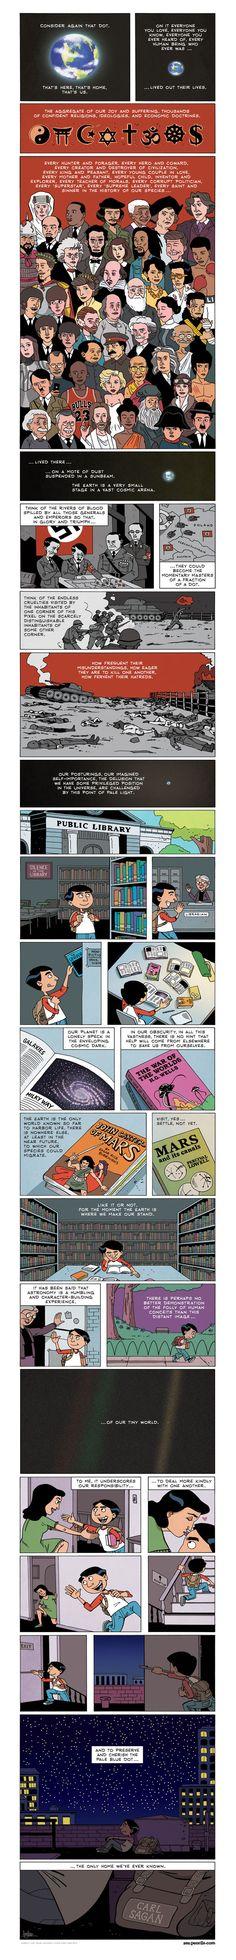 Zen Pencils Comic Strip, February 17, 2014 on GoComics.com